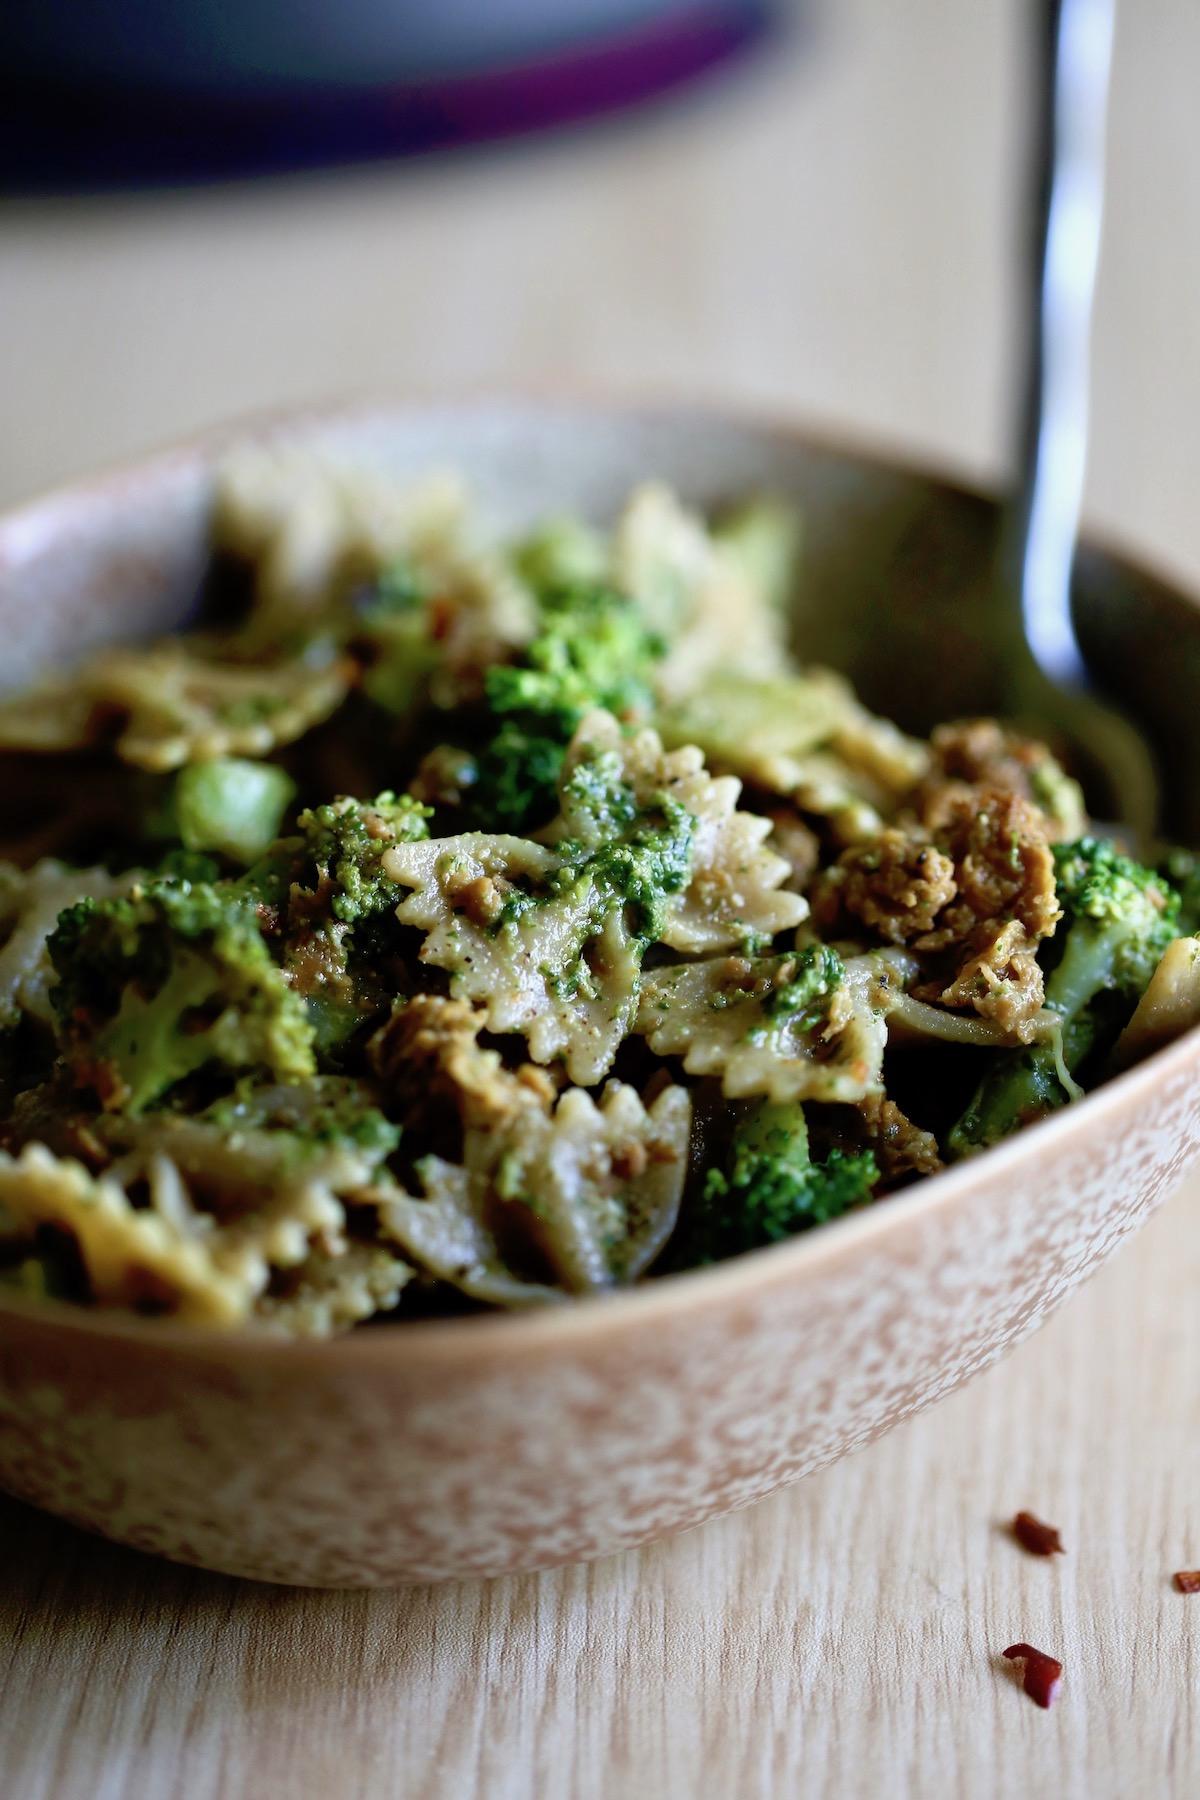 vegan sausage pesto pasta with broccoli piled high in a bowl